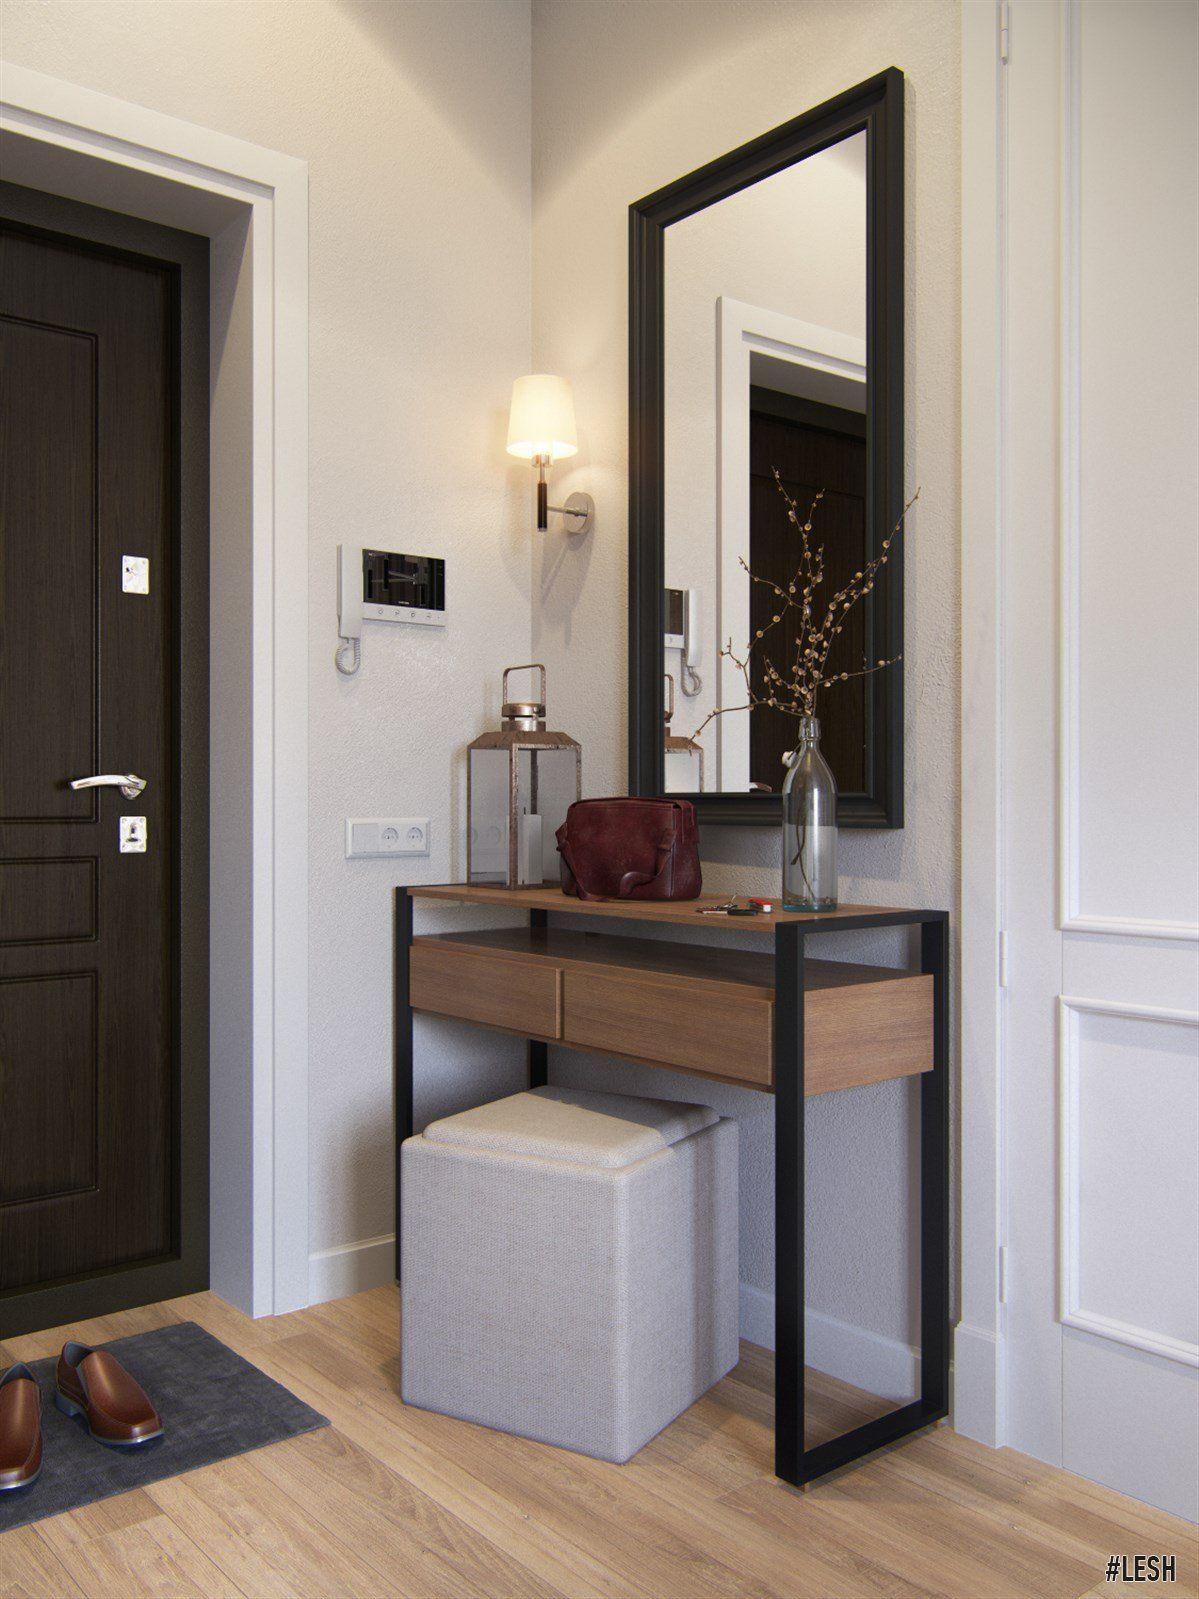 Modern hallway furniture ideas  Eclectic hallway  LESH design interior hall modern small light